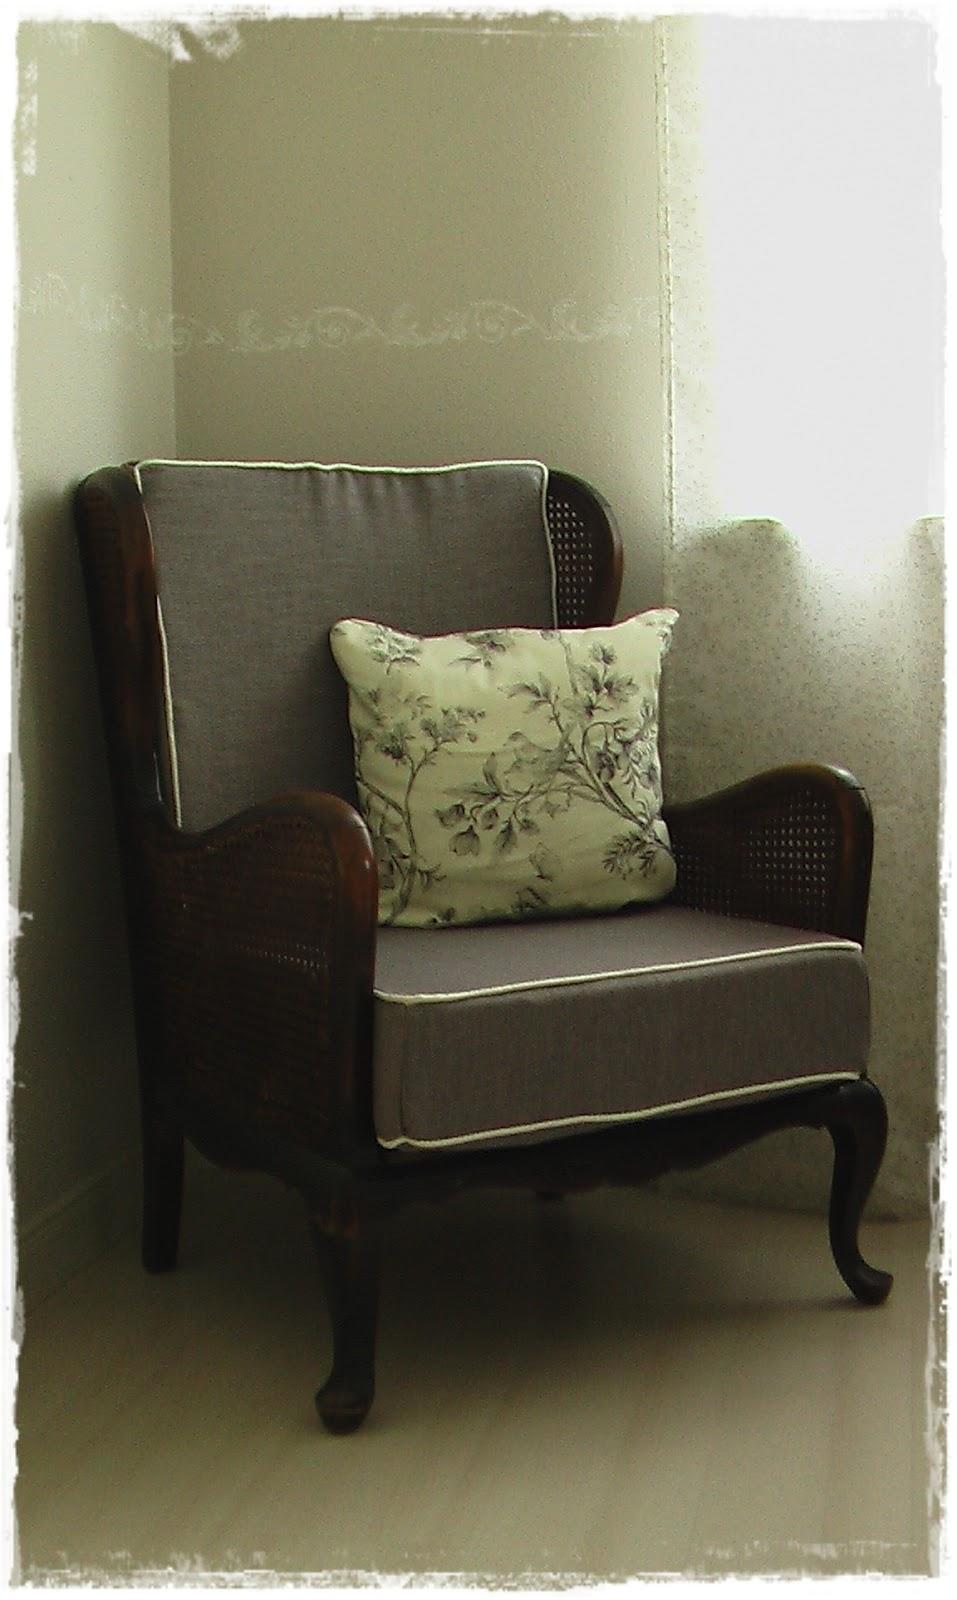 Maison blavand sessel strahlt im neuen glanz for Sessel versenden